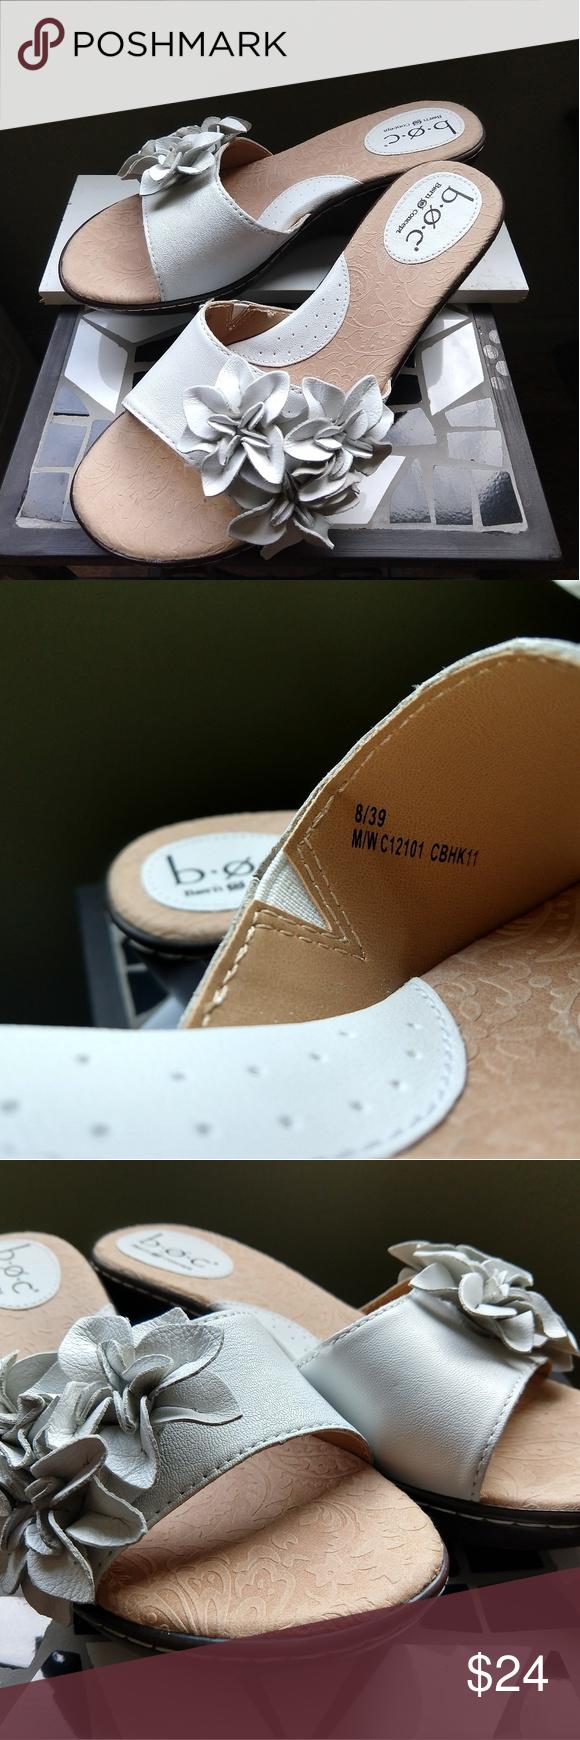 d184cf97fc Born BOC White leather Slip on Sandals BOC Born Concept Womens White  Leather Slip On Open Toe Flowers Solid Wedges Sz 8 Born Shoes Sandals